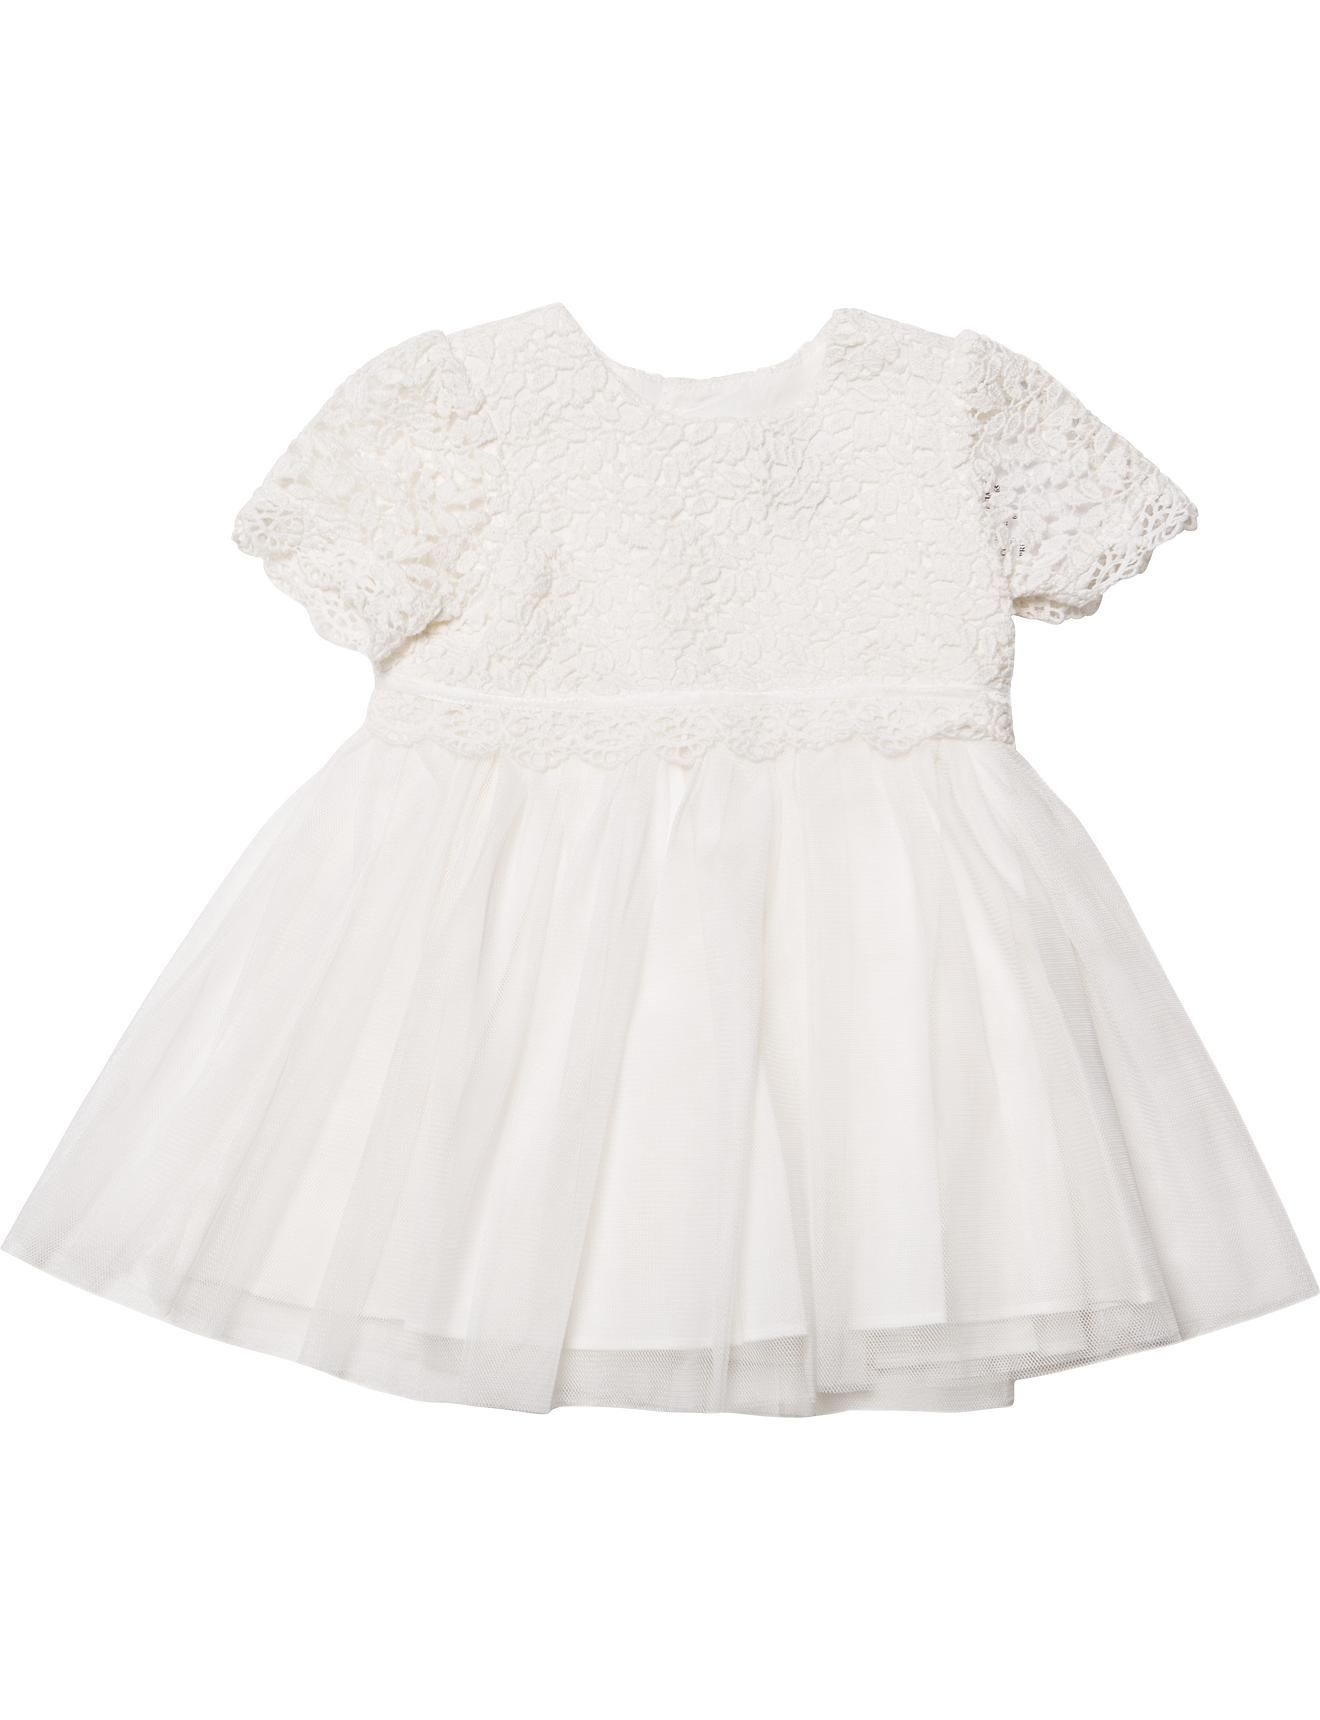 Bebe Lace Bodice Short Sleeve Dress | David Jones